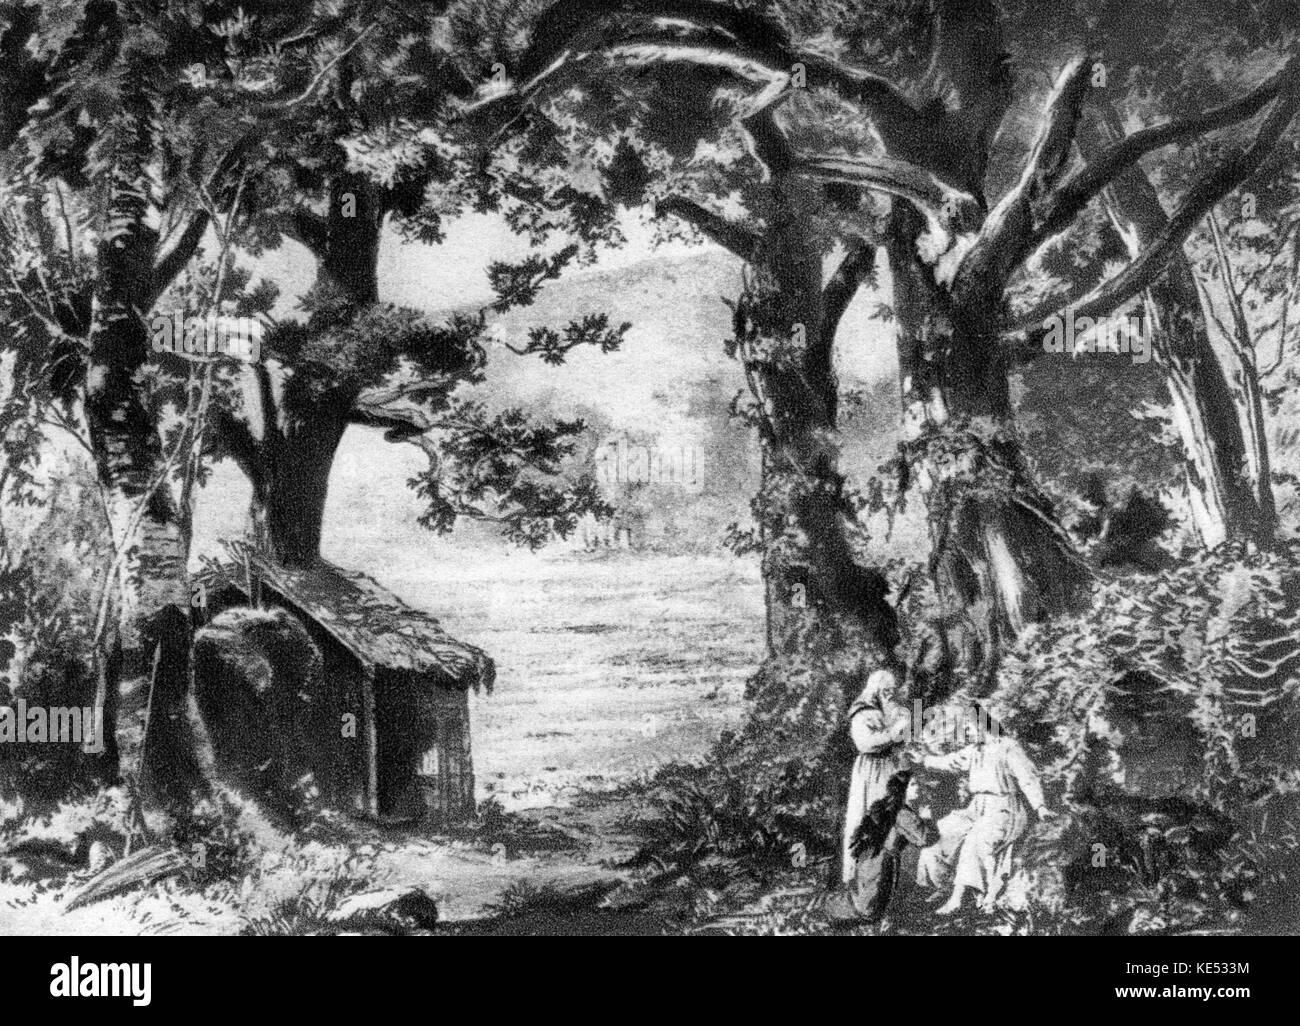 Scene from Richard Wagner 's opera Parsifal - original set design by Paul Joukowsky. RW: German composer, 22 - Stock Image